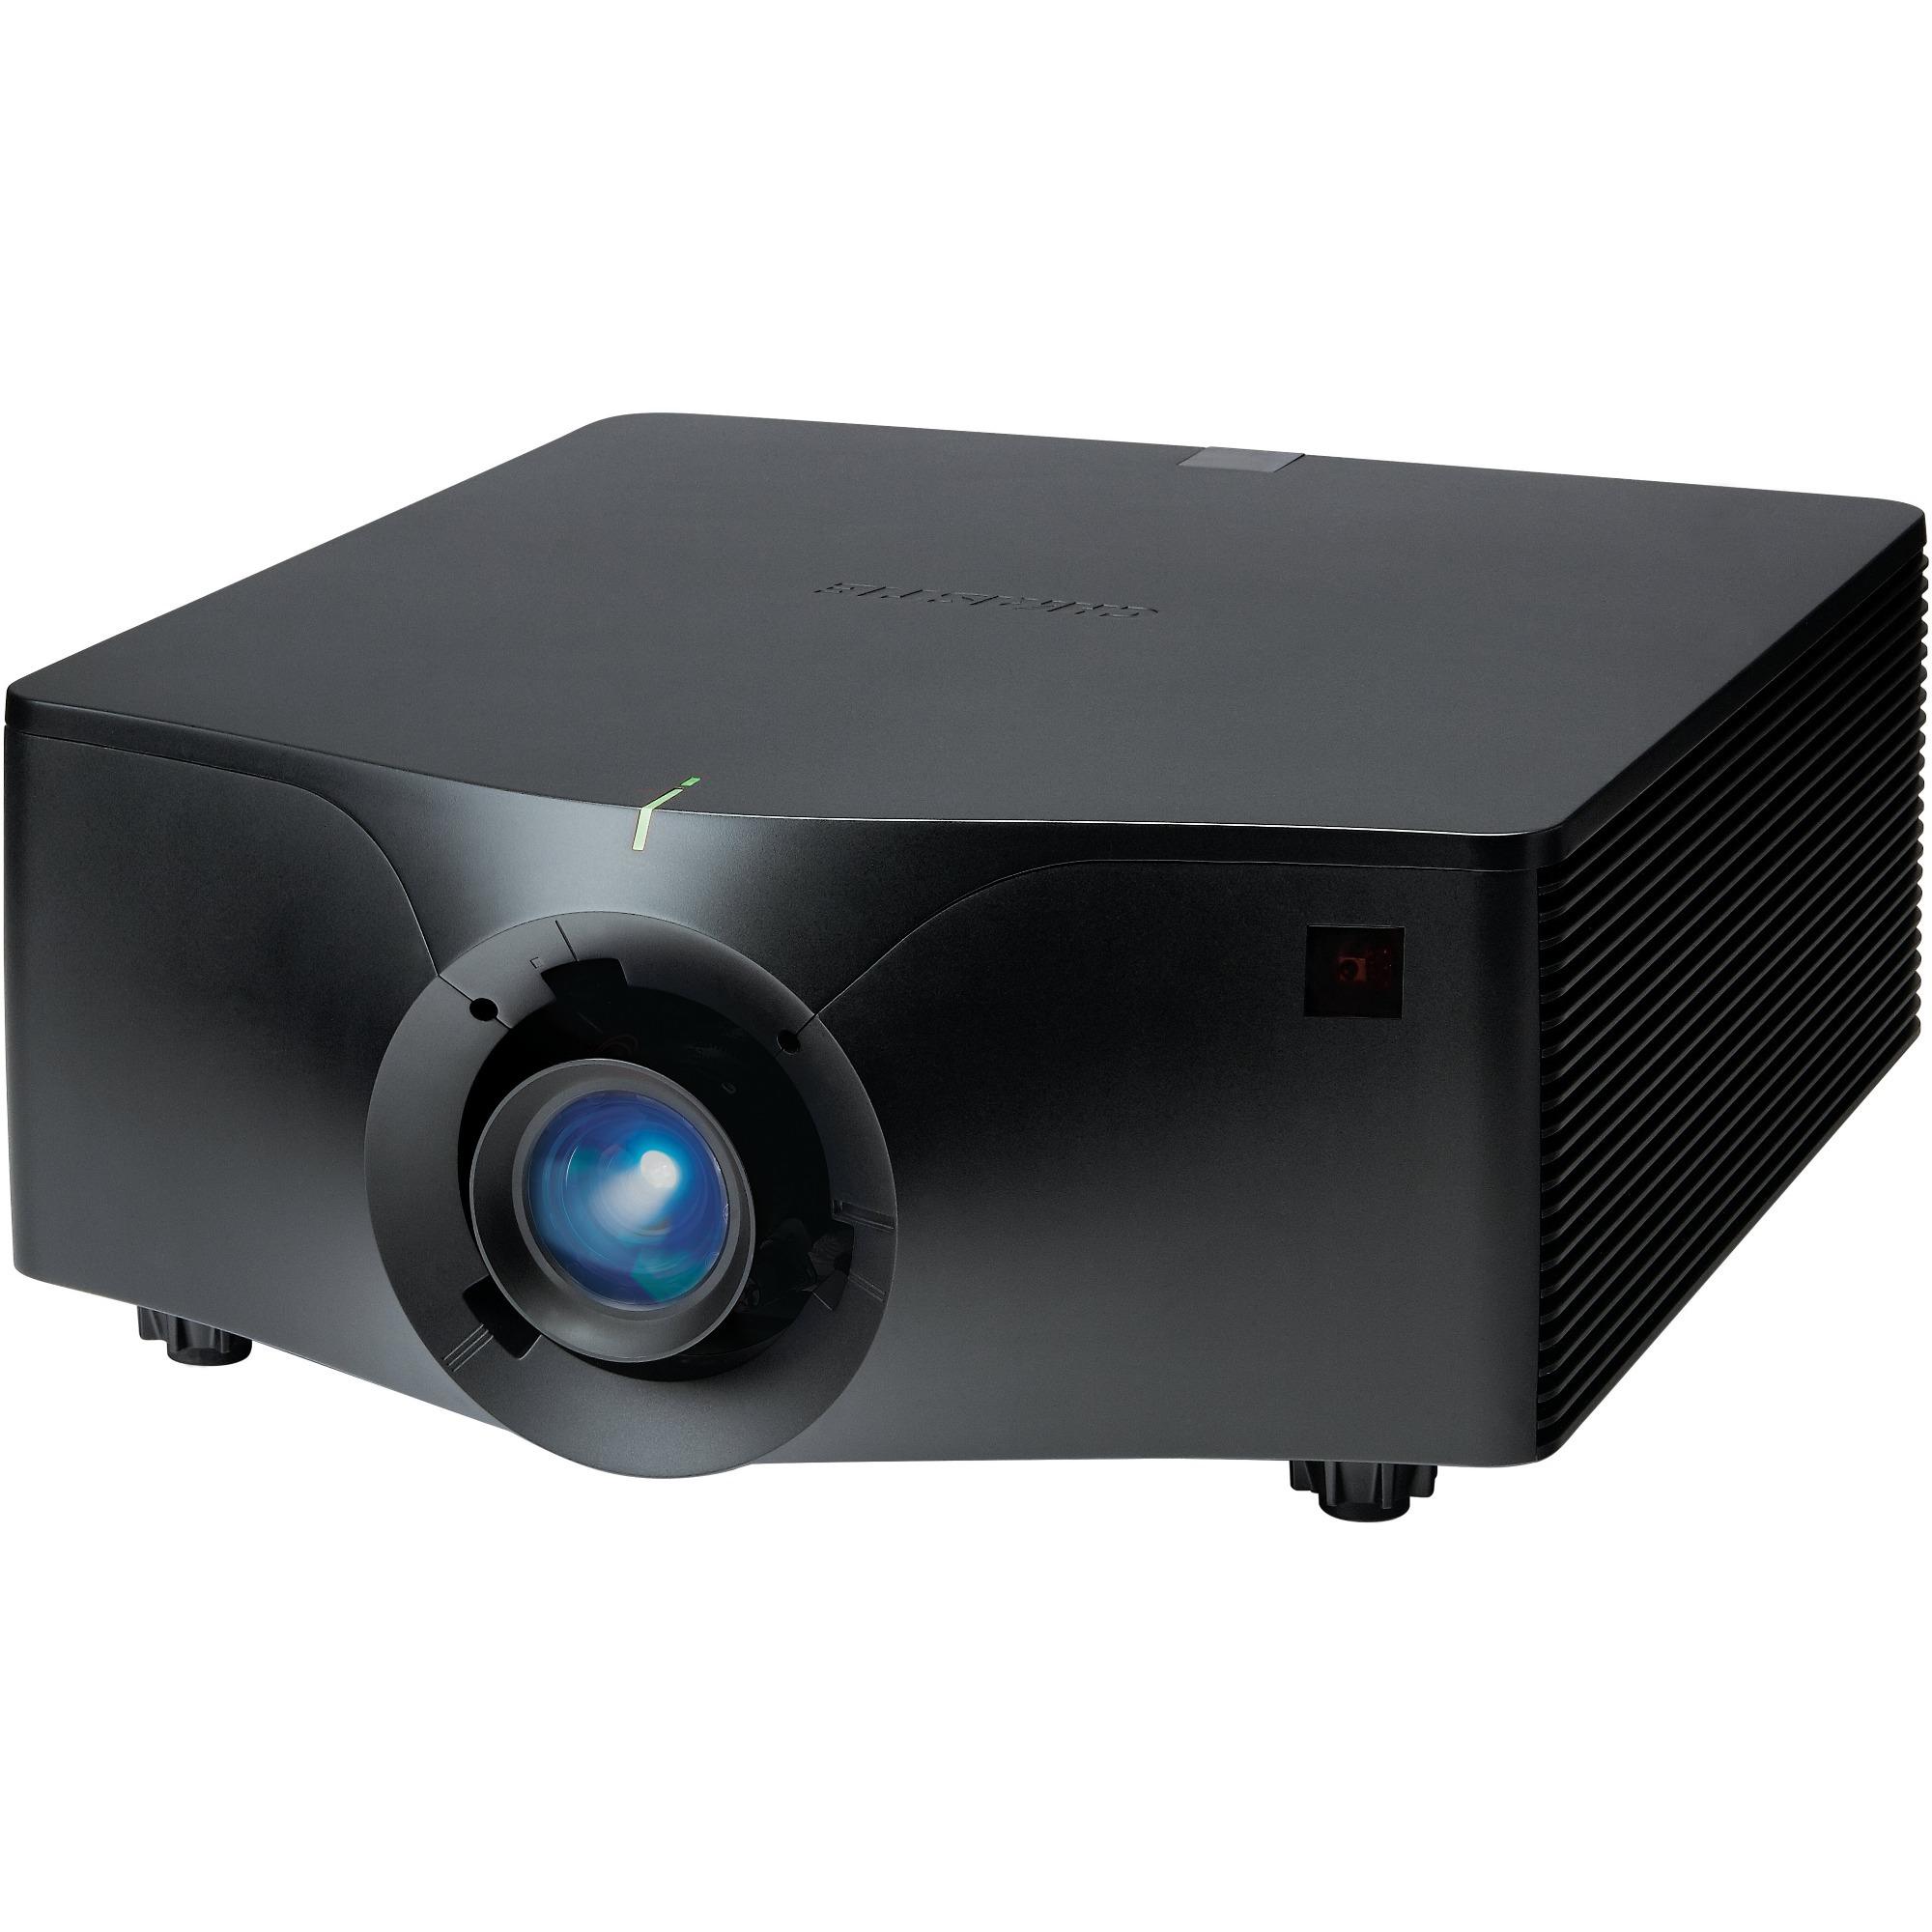 Christie Digital DHD850-GS 3D DLP Projector - Black - TAA Compliant_subImage_1